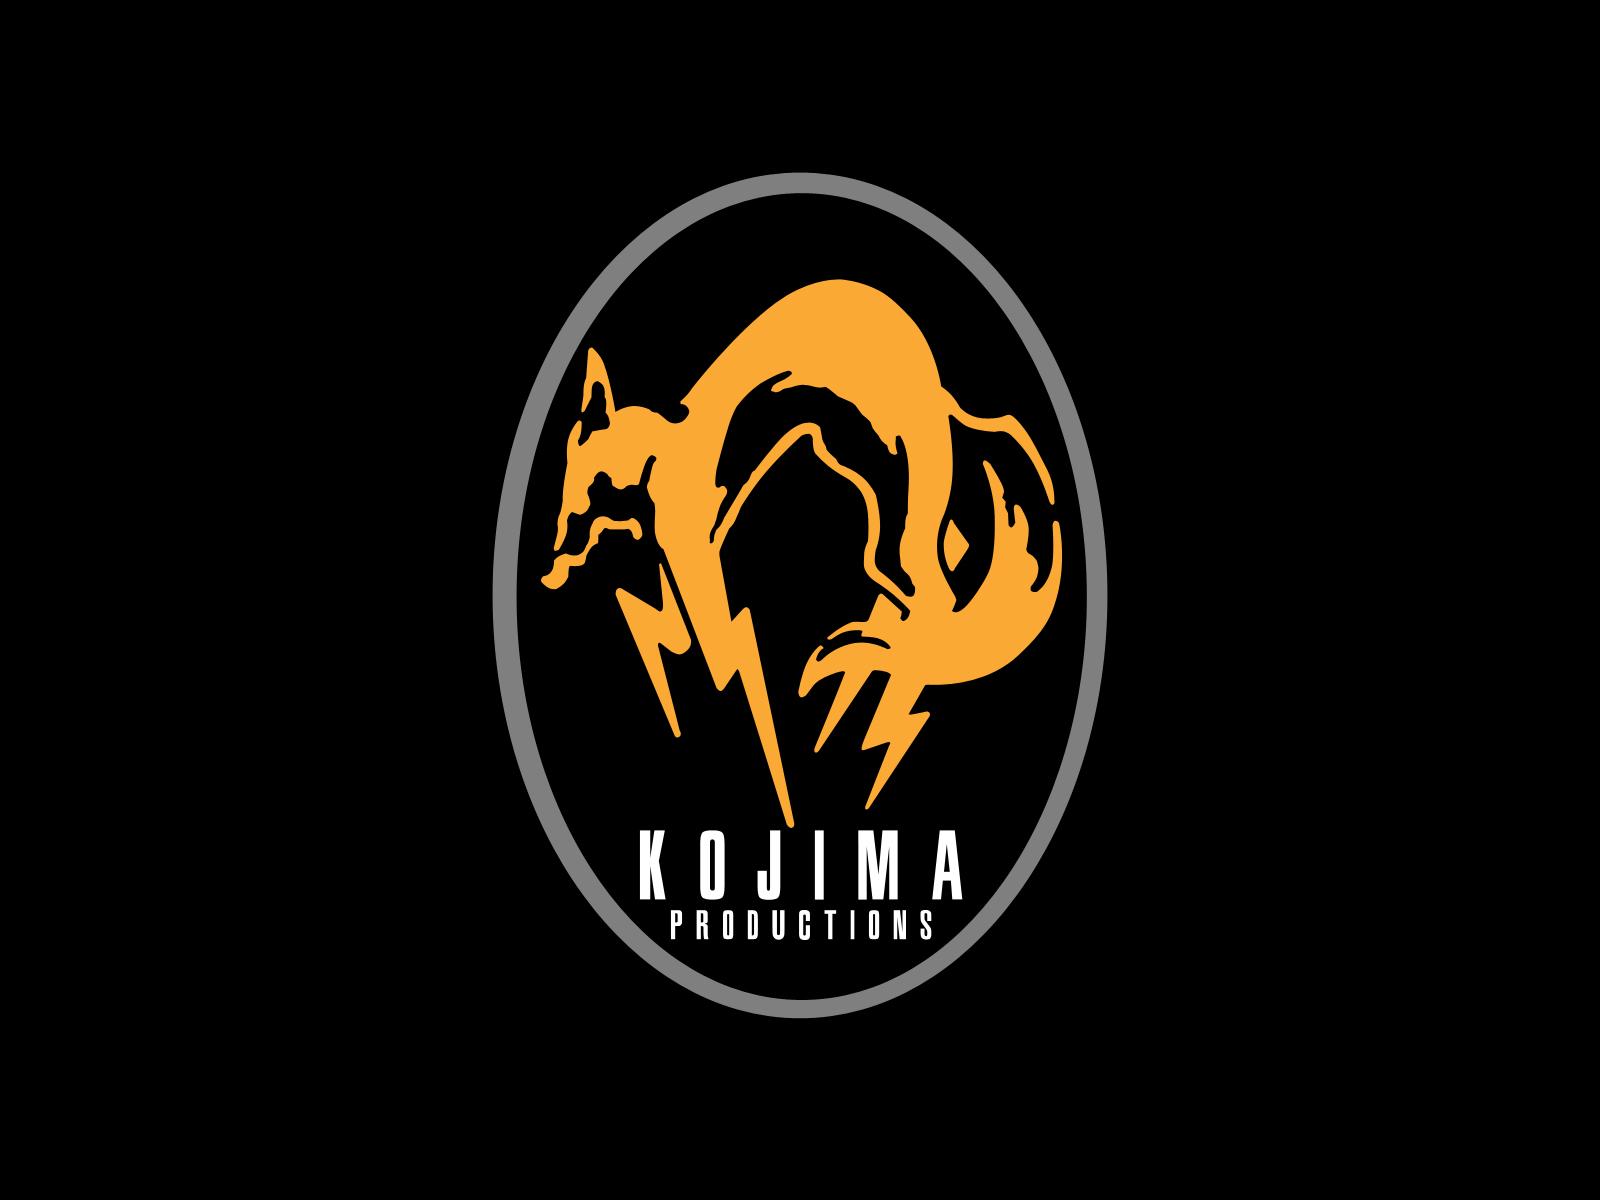 Hideo Kojima Production